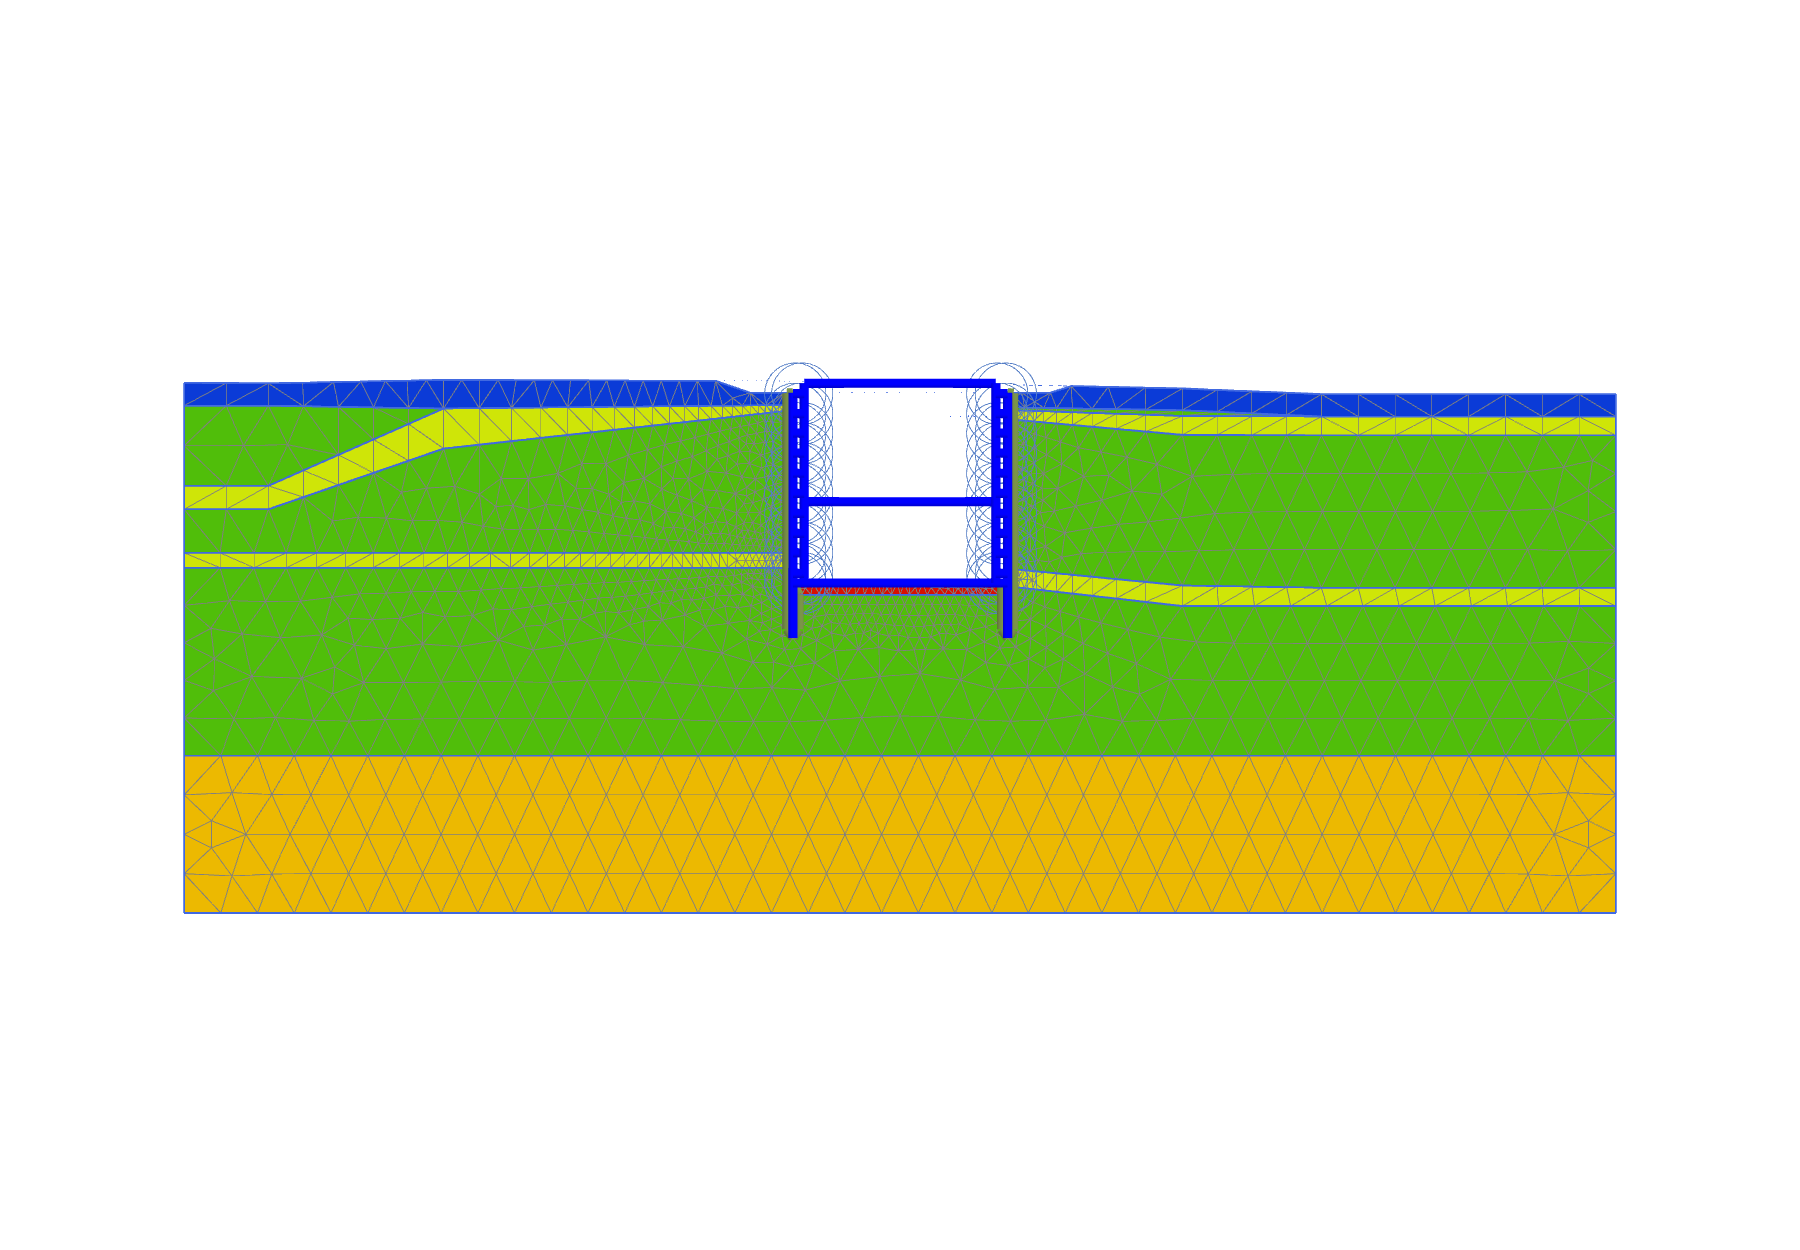 Diseño de túneles y obras subterráneas Projectes subterranis underground projects